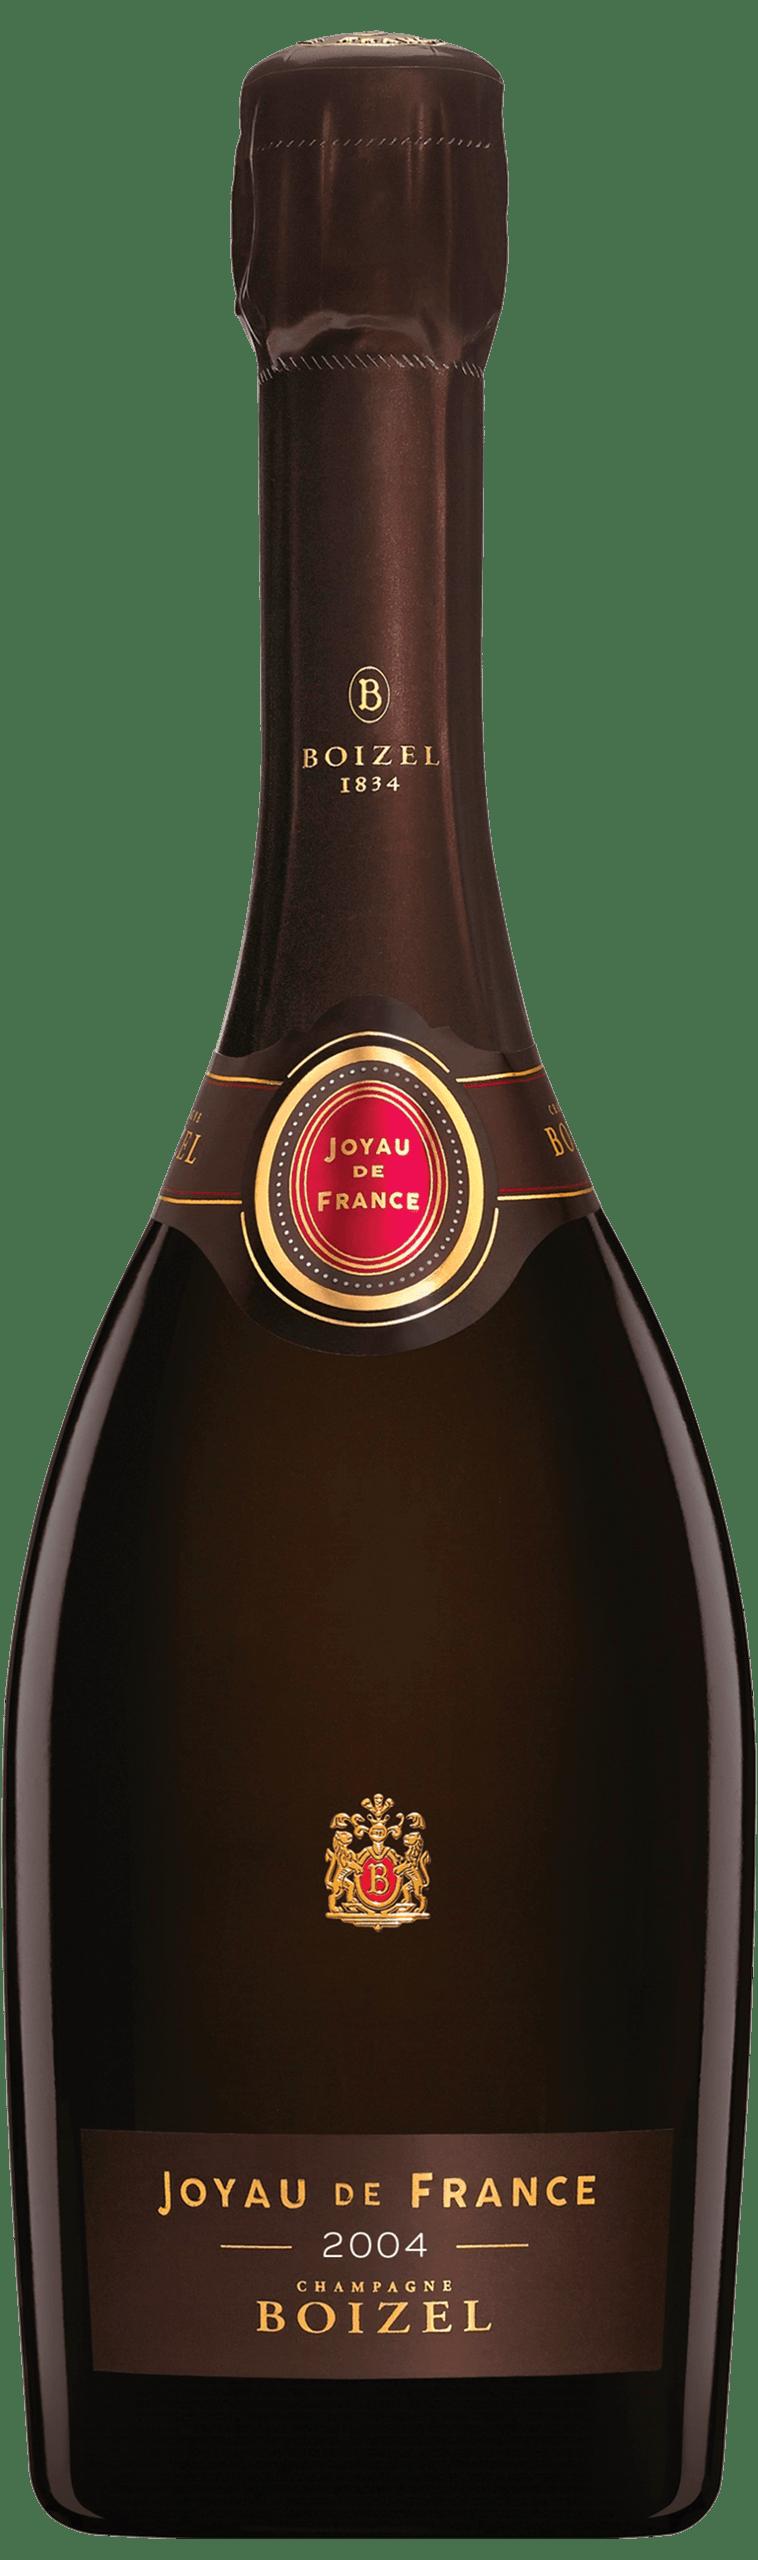 Joyau de France 2004 - Champagne Boizel - Epernay France